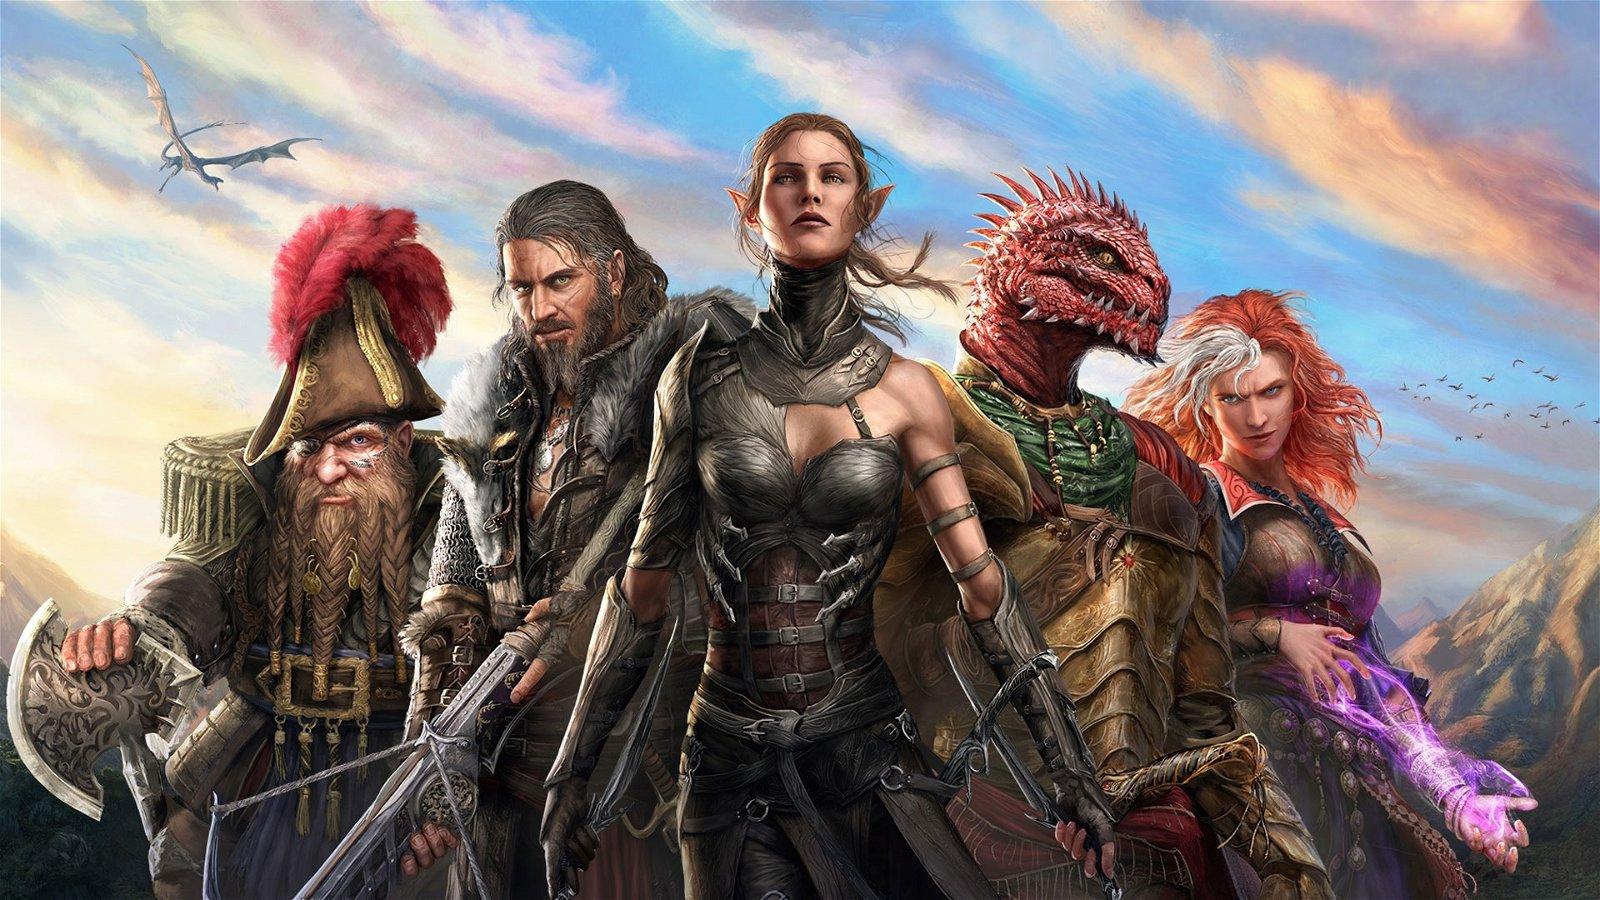 Divinity Original Sin 2 (PC) Review -  A Modern RPG Classic